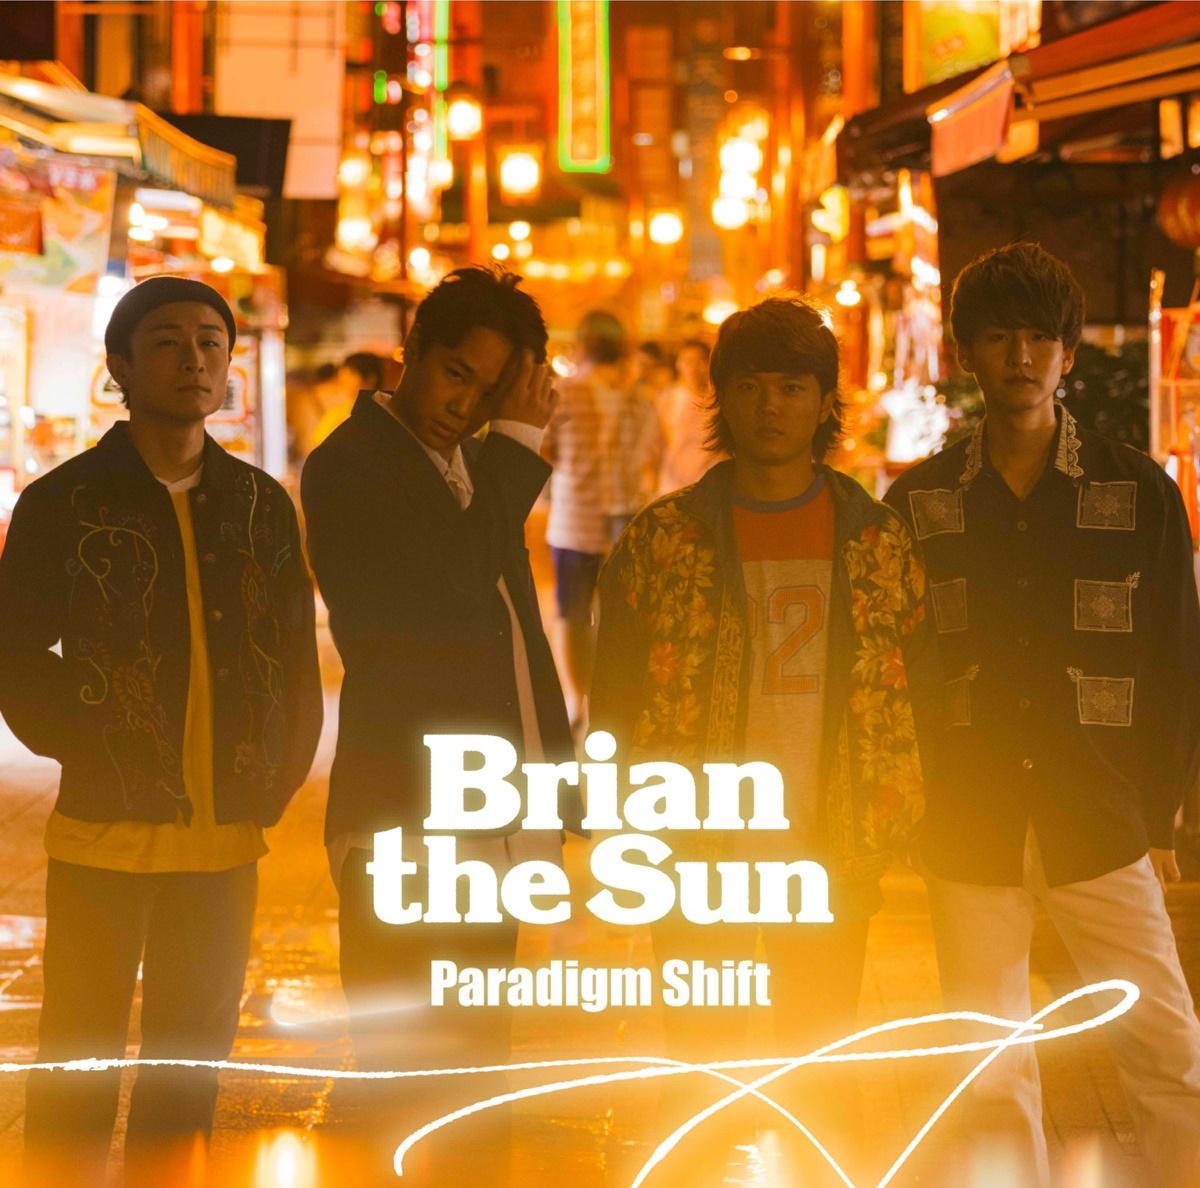 『Brian the Sun - パラダイムシフト 歌詞』収録の『パラダイムシフト』ジャケット